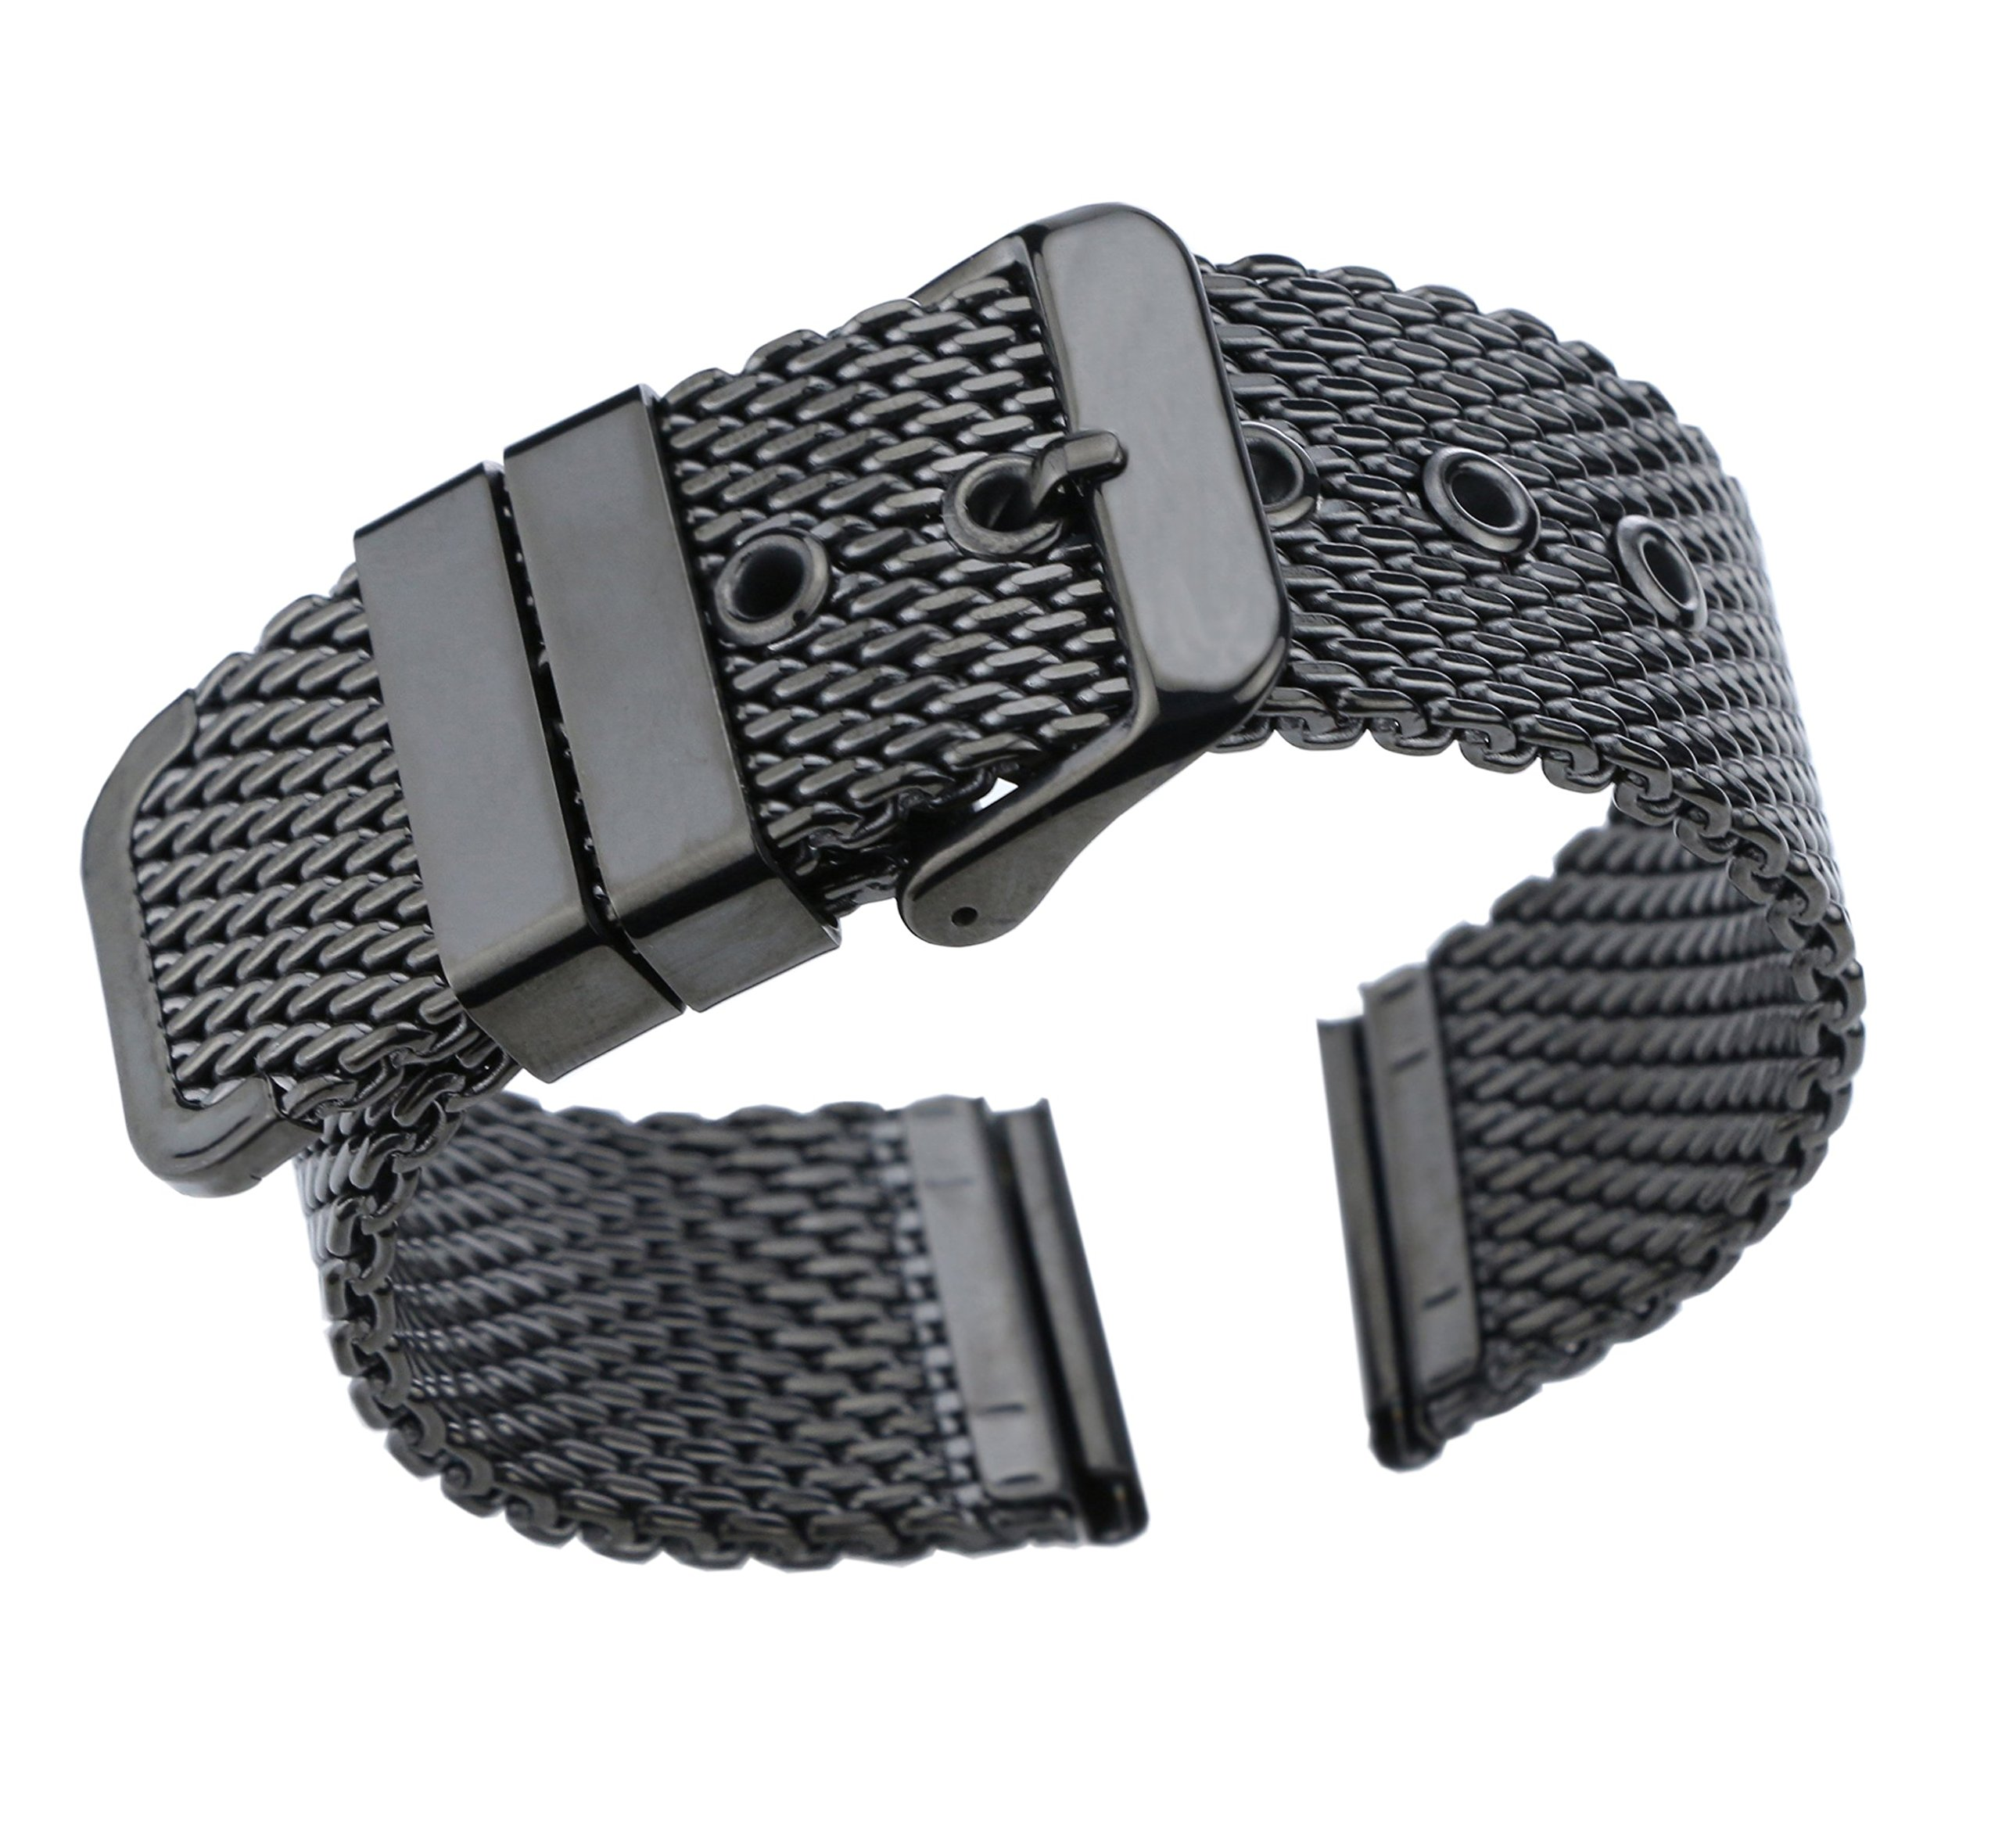 20mm Luxury Black Milanese Loop Bracelets Polished Mesh Steel Watch Band Solid 316L Stainless Steel